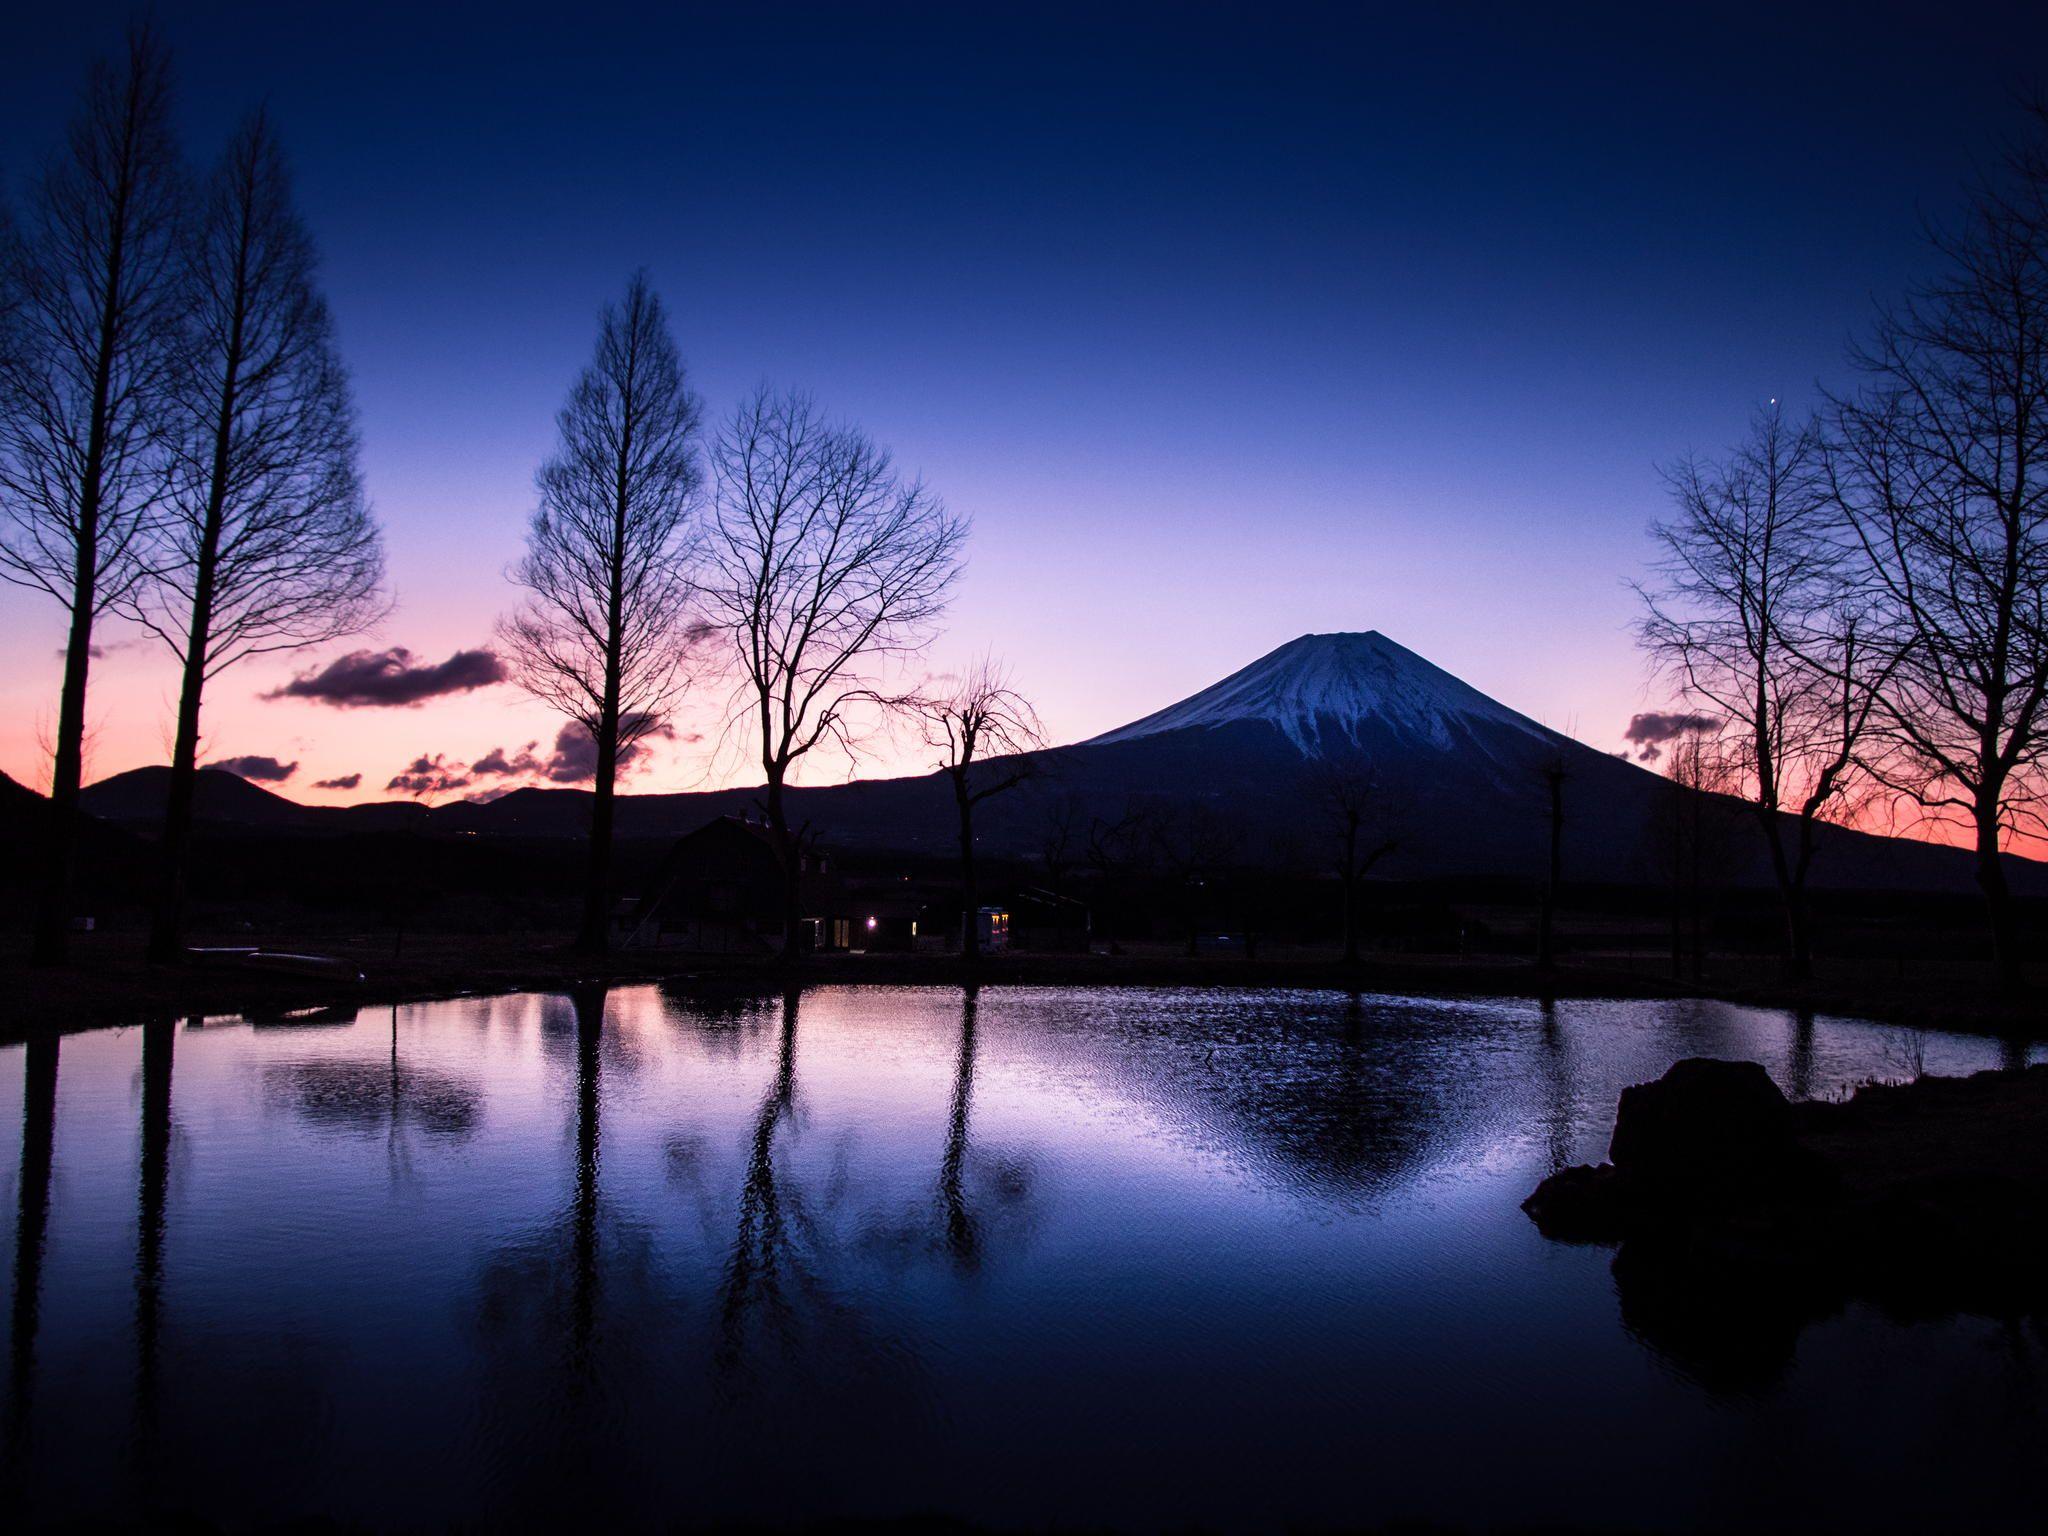 Quiet morning by Noriko Okashita on 500px